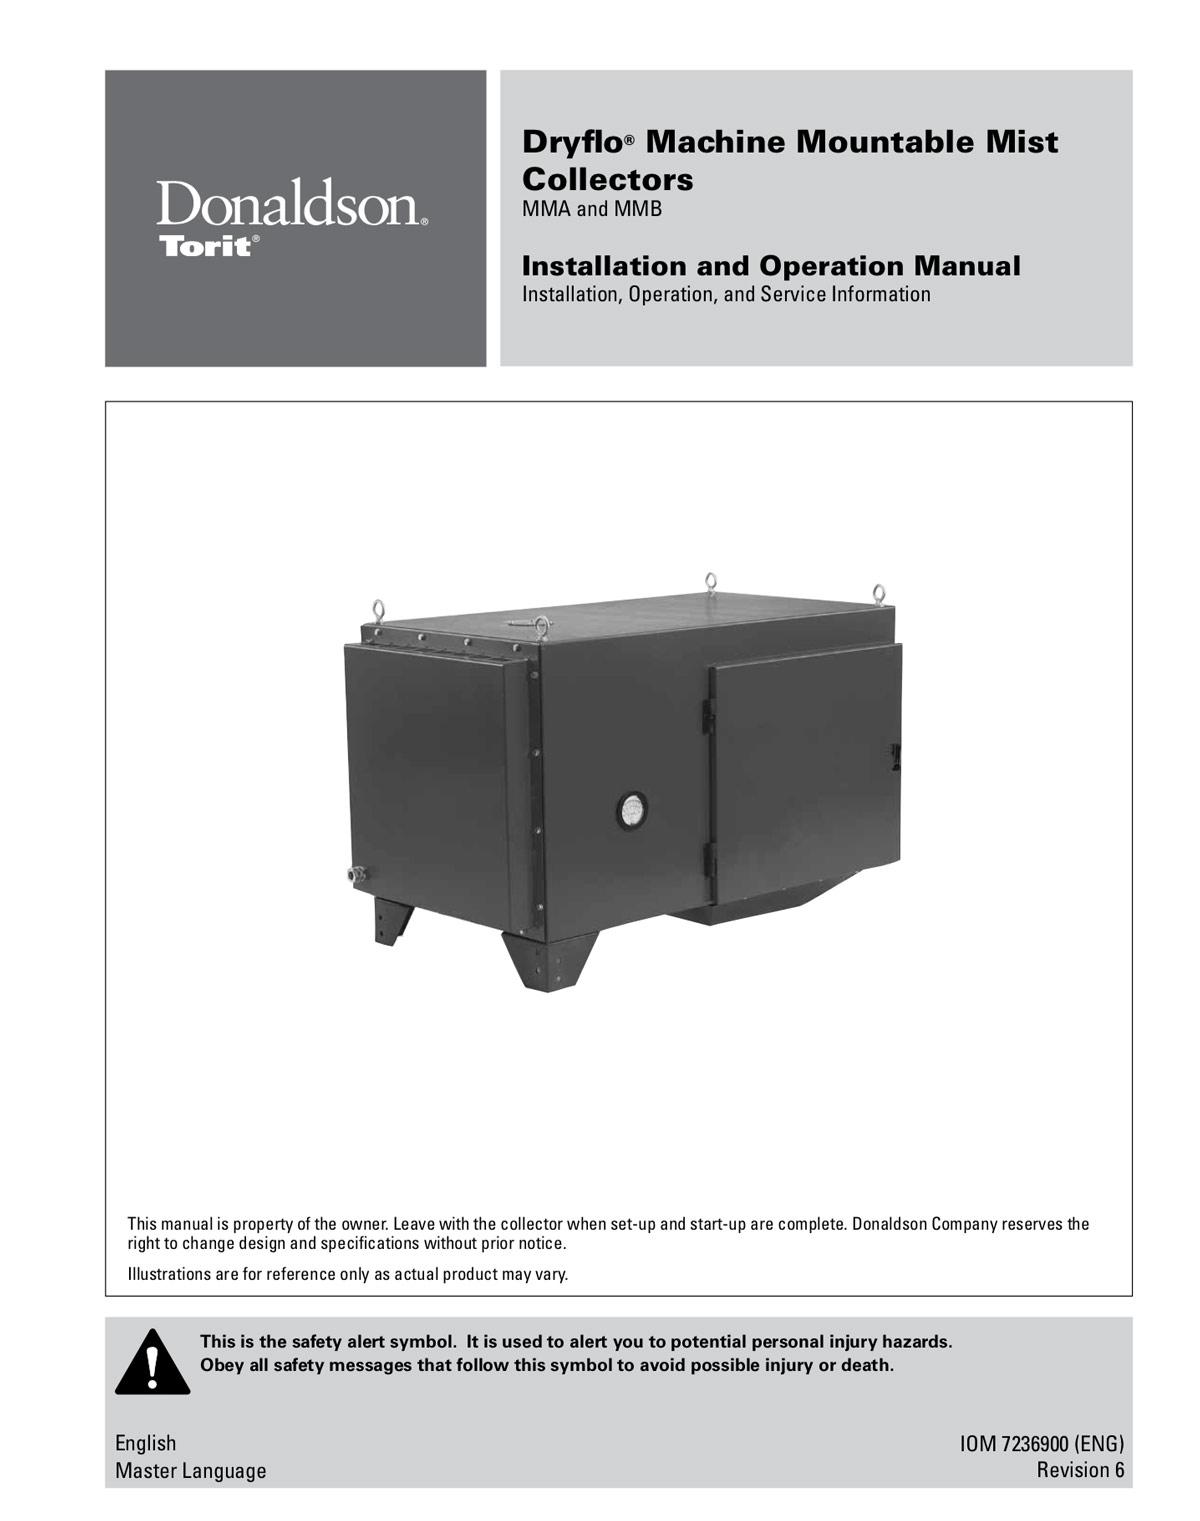 Dryflo Machine Mountable Mist Collectors IOM